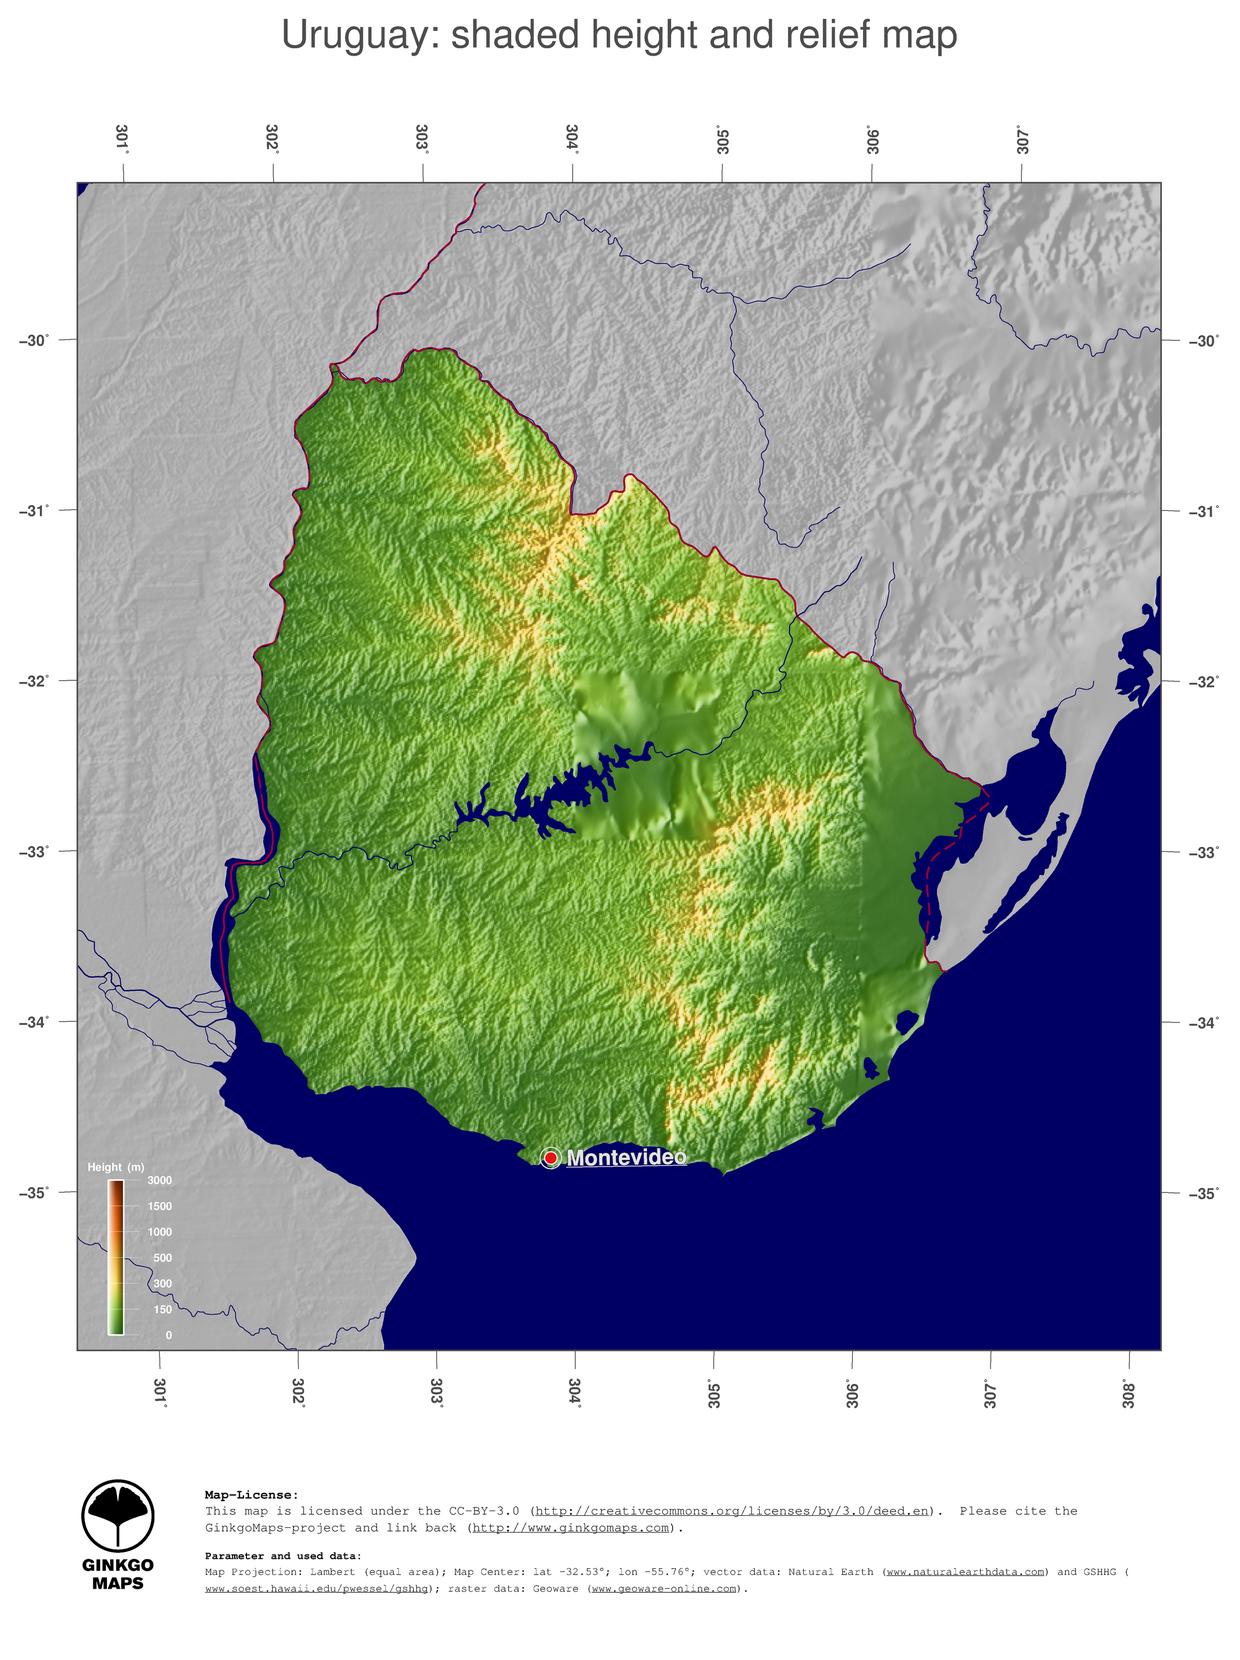 Map Uruguay GinkgoMaps Continent South America Region Uruguay - Uruguay relief map